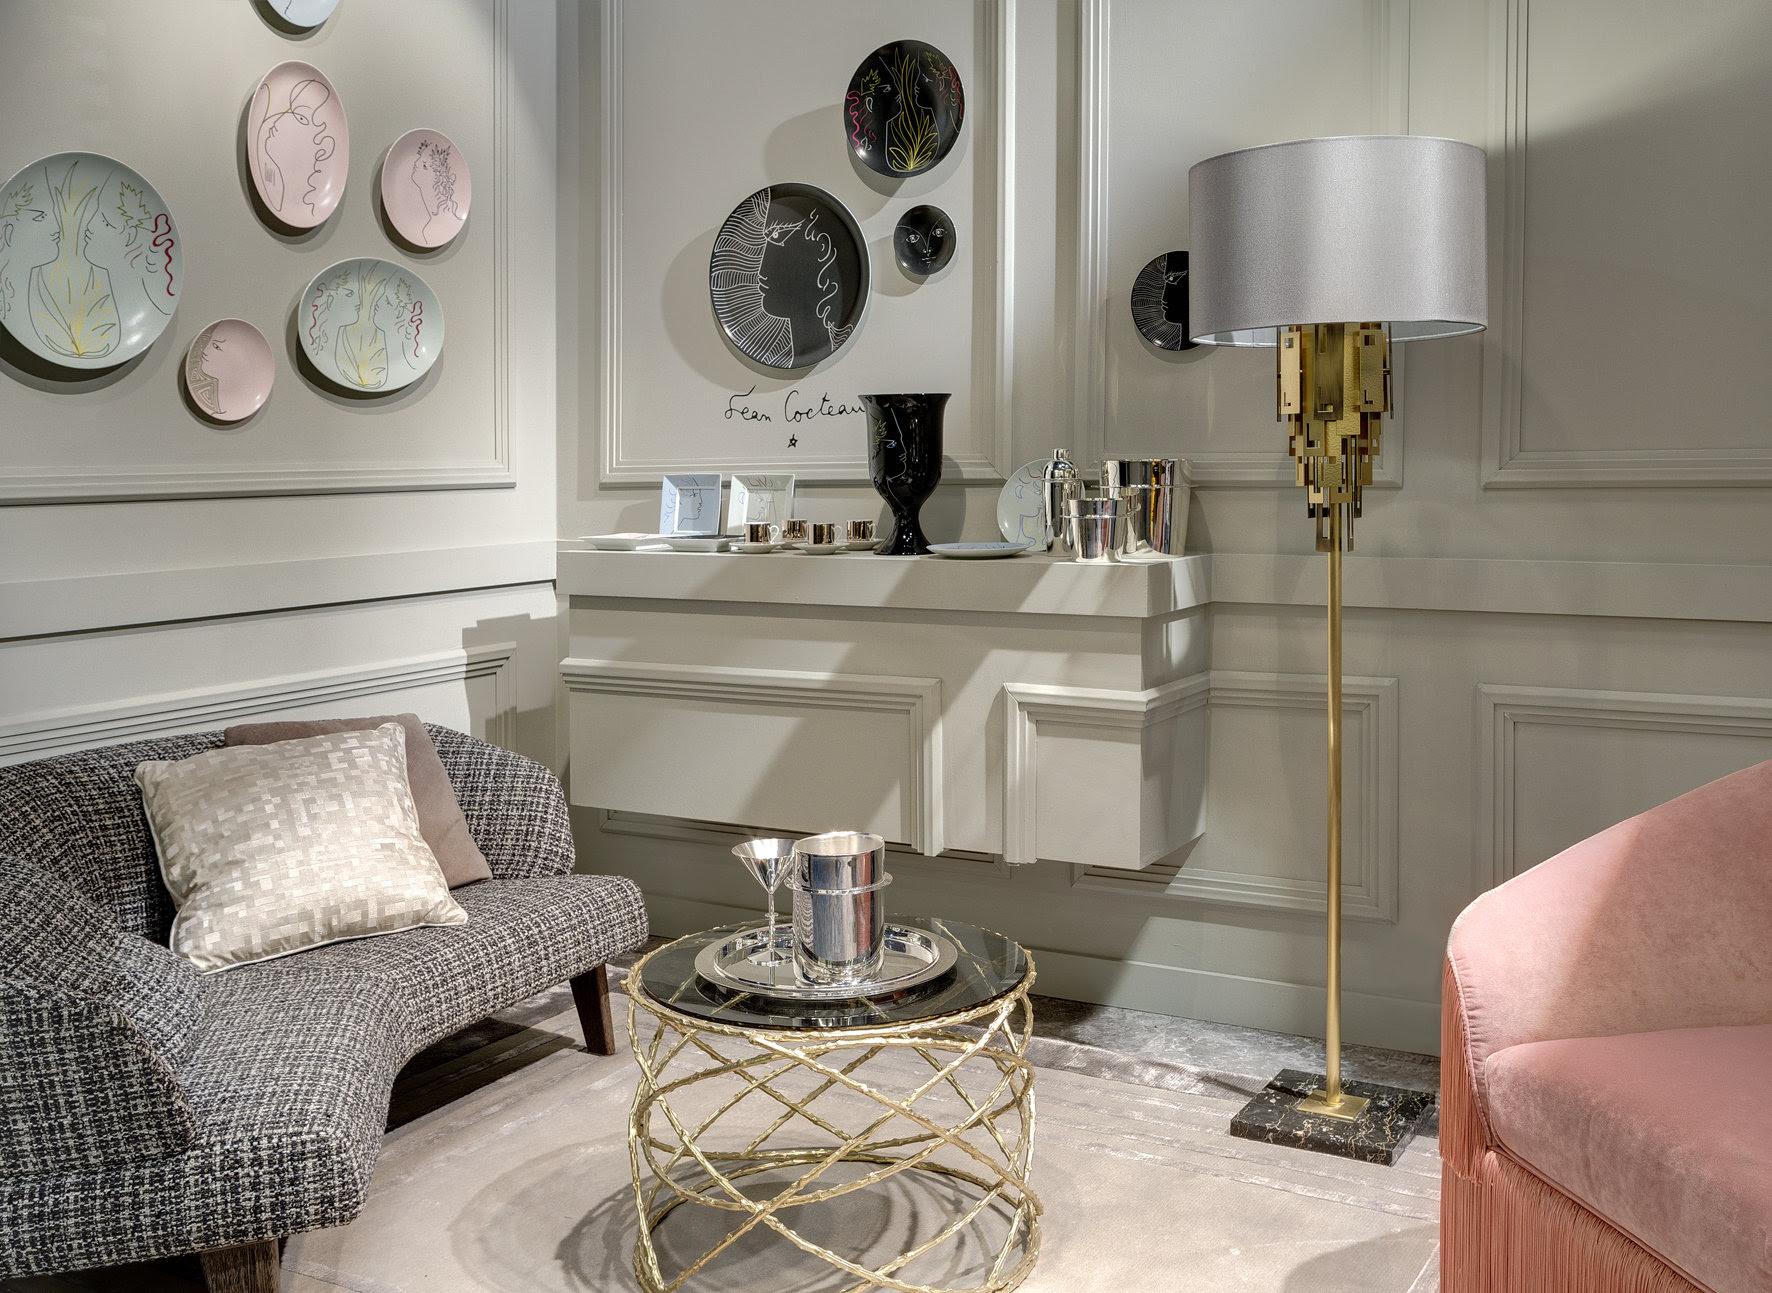 MSH at Salone - Officina Luce Glam collection new floor lamp - Masha Shapiro Agency UK.jpg